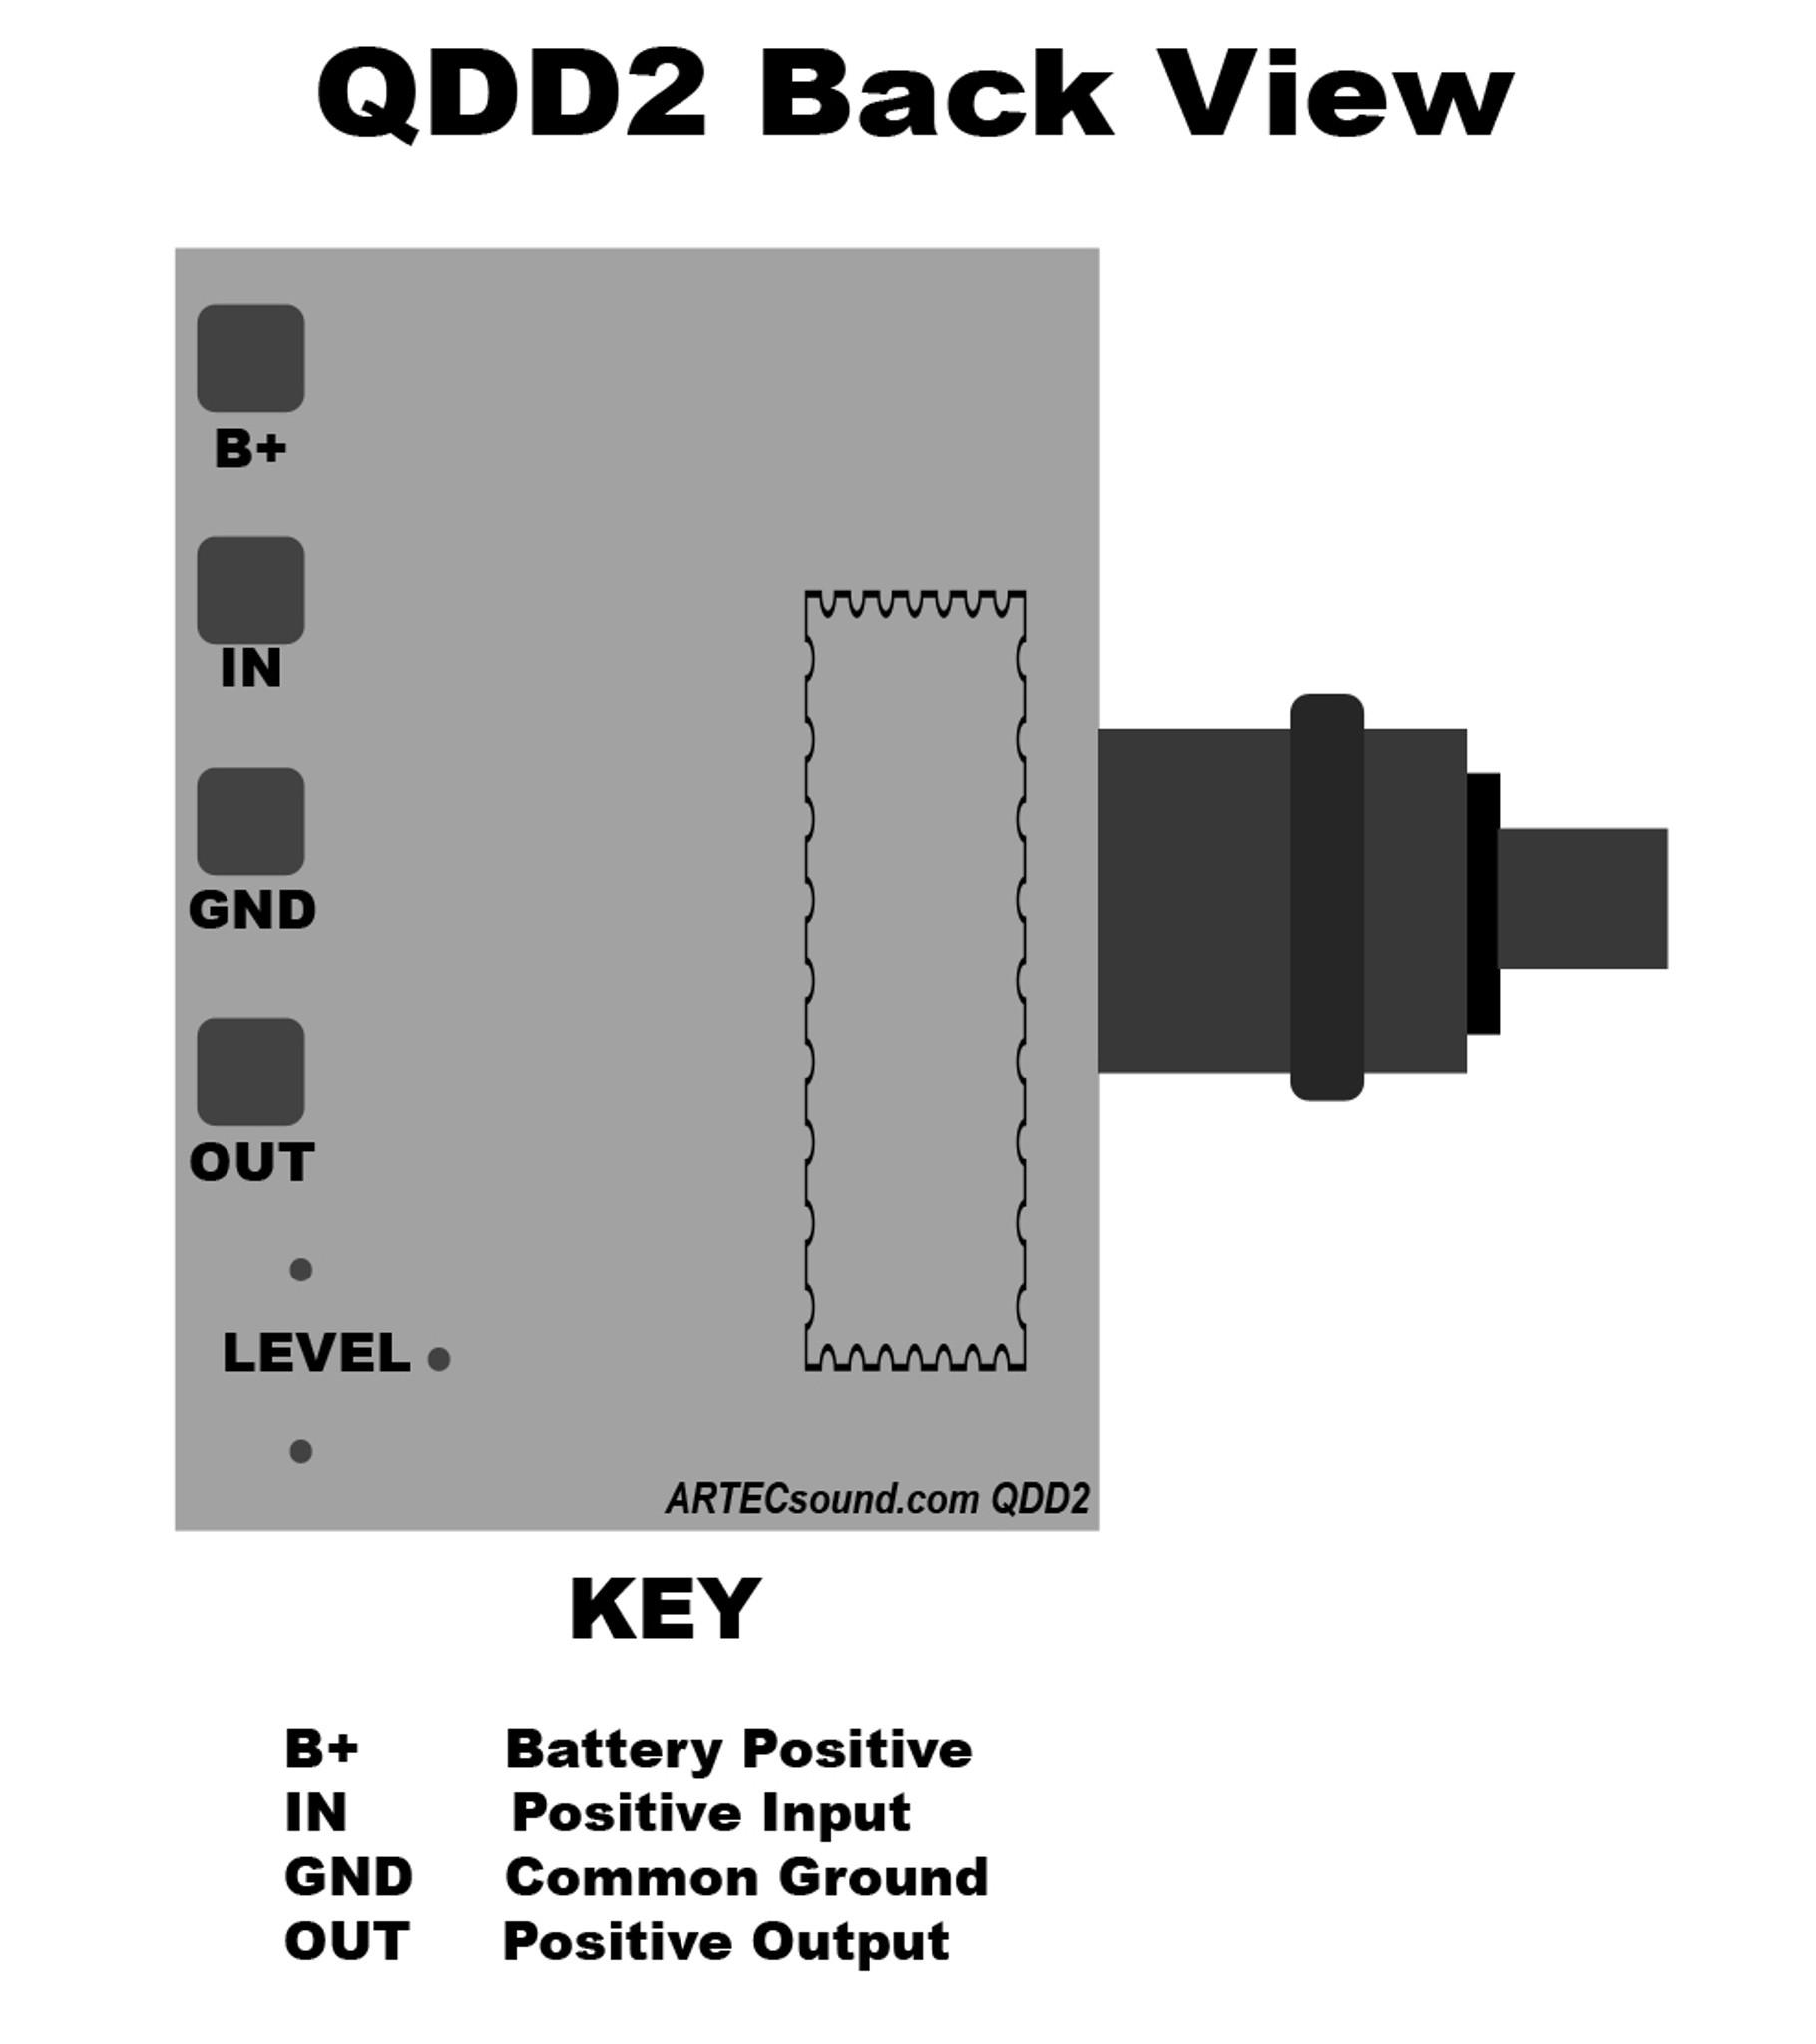 psycho knob board internal distortion boost overdrive for guitar rh cbgitty com Light Switch Wiring Diagram Light Switch Wiring Diagram